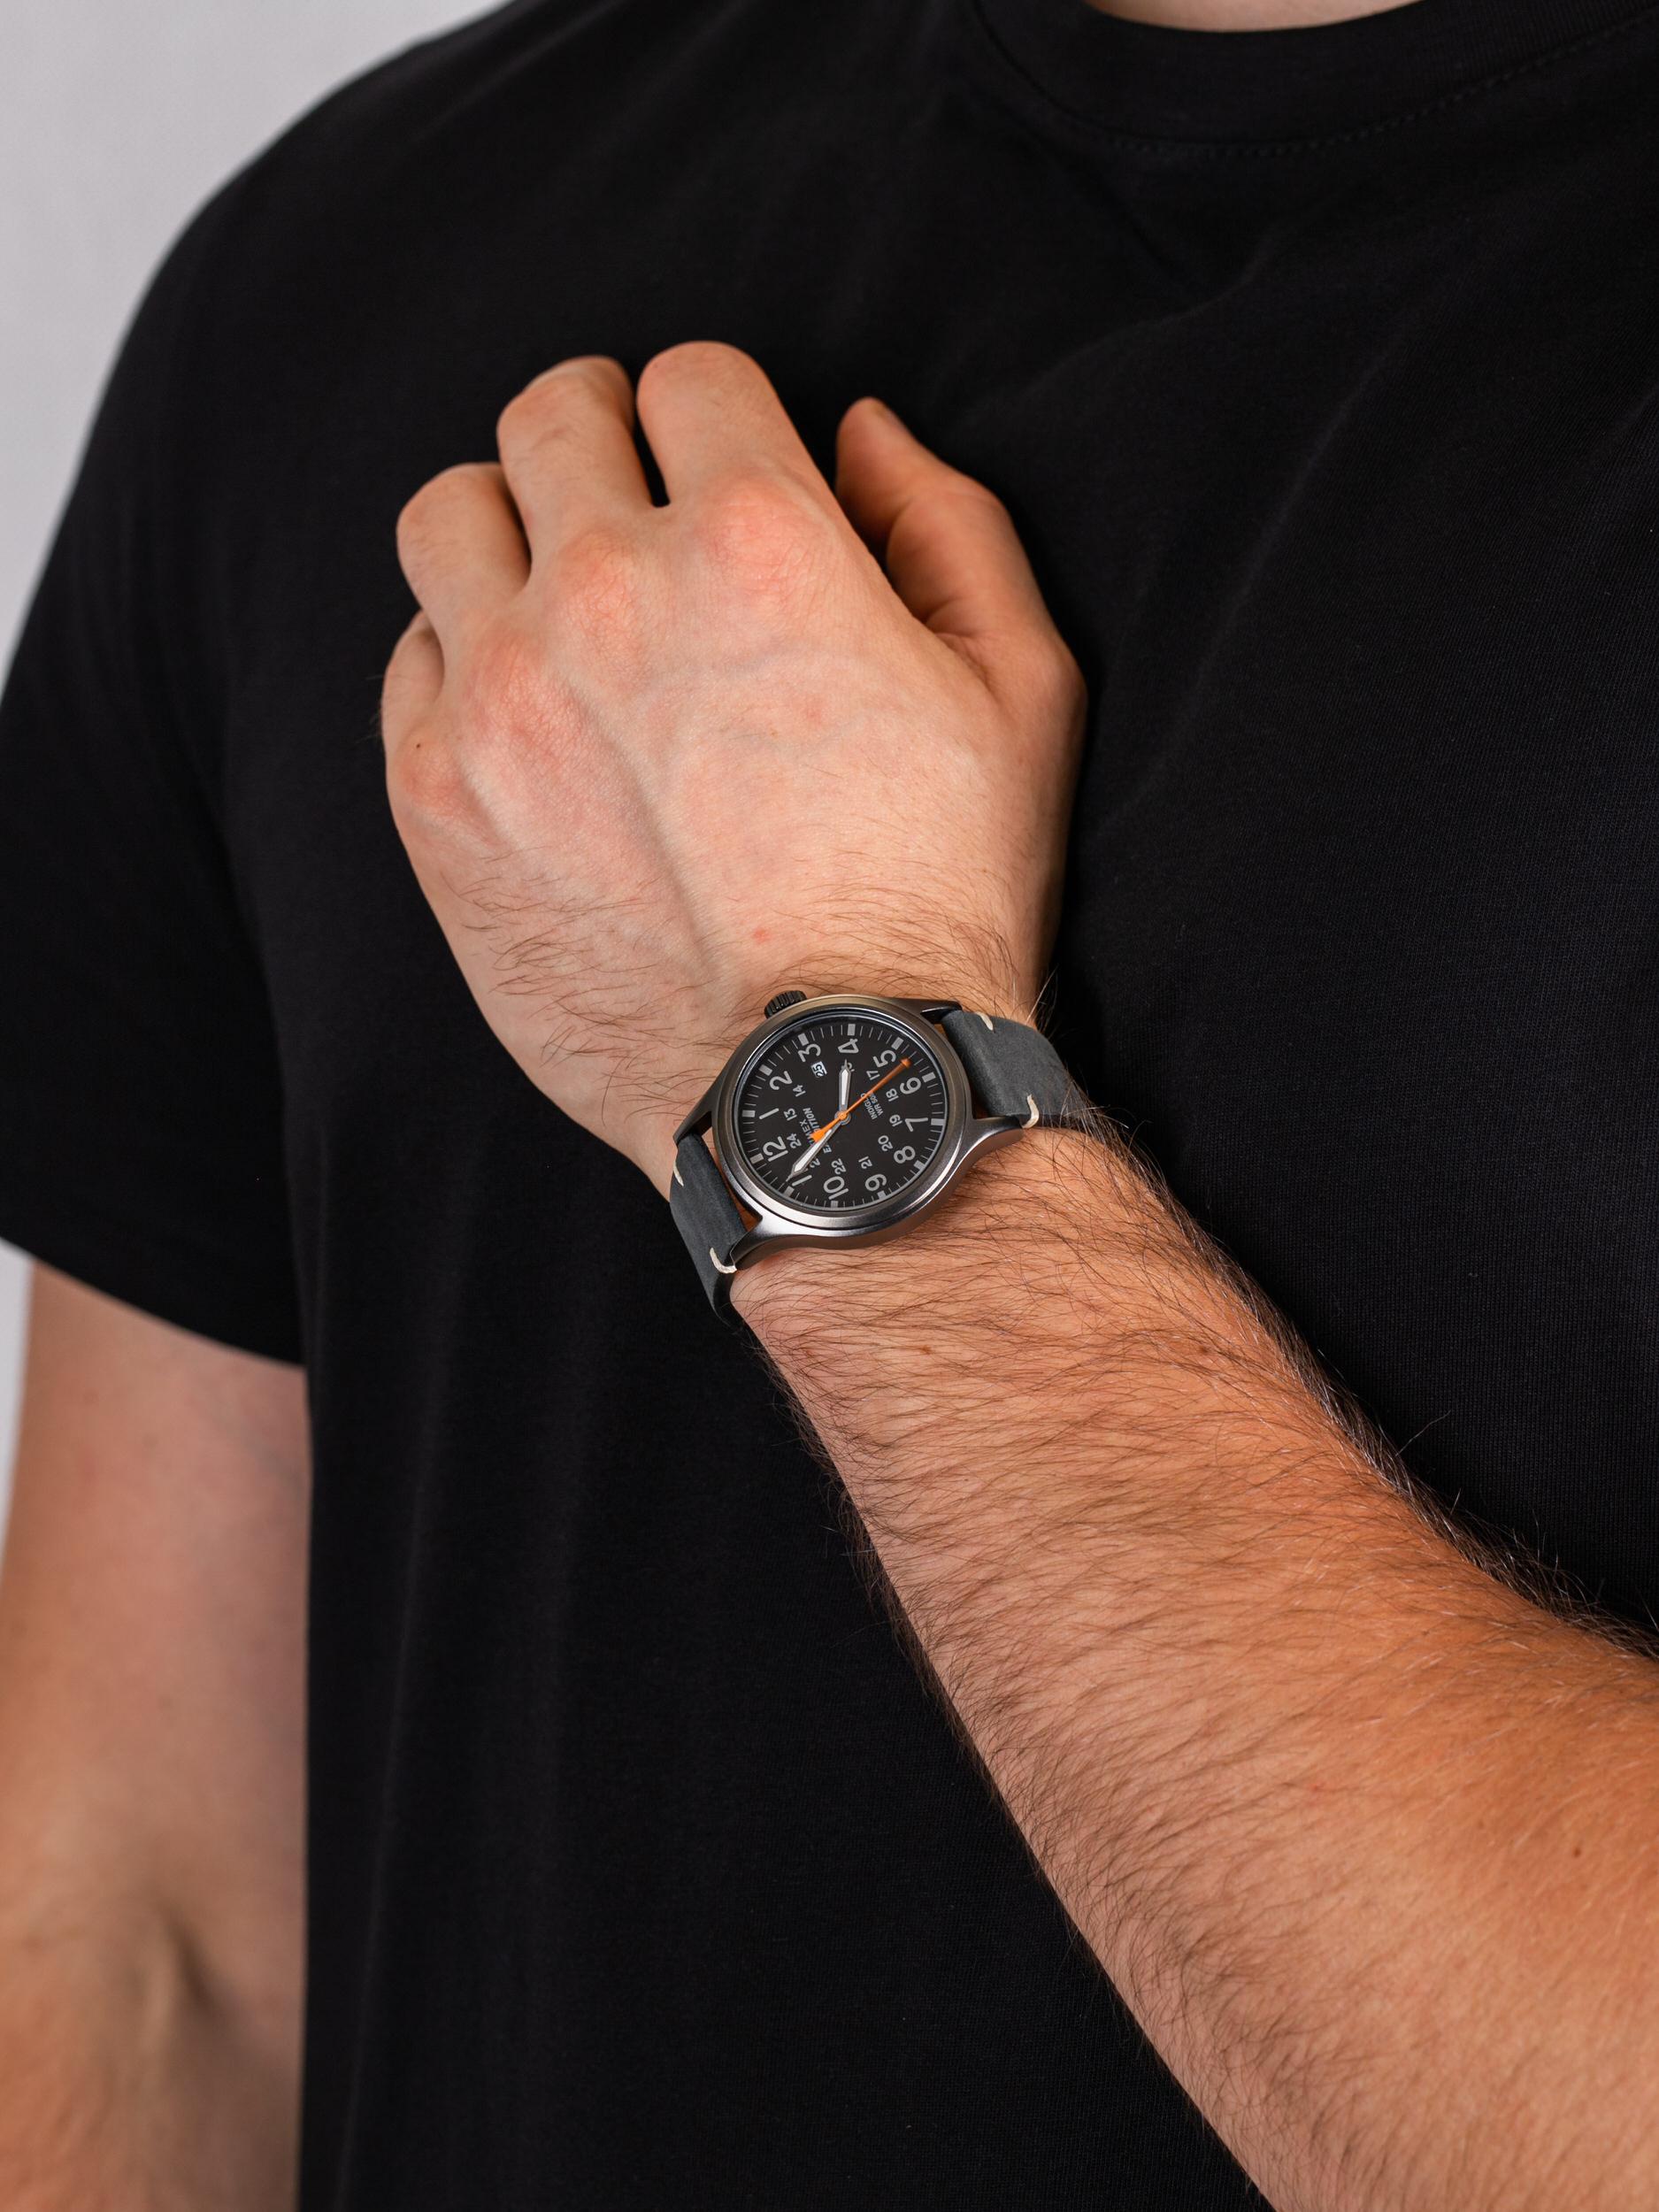 Timex TW4B01900 męski zegarek Expedition pasek